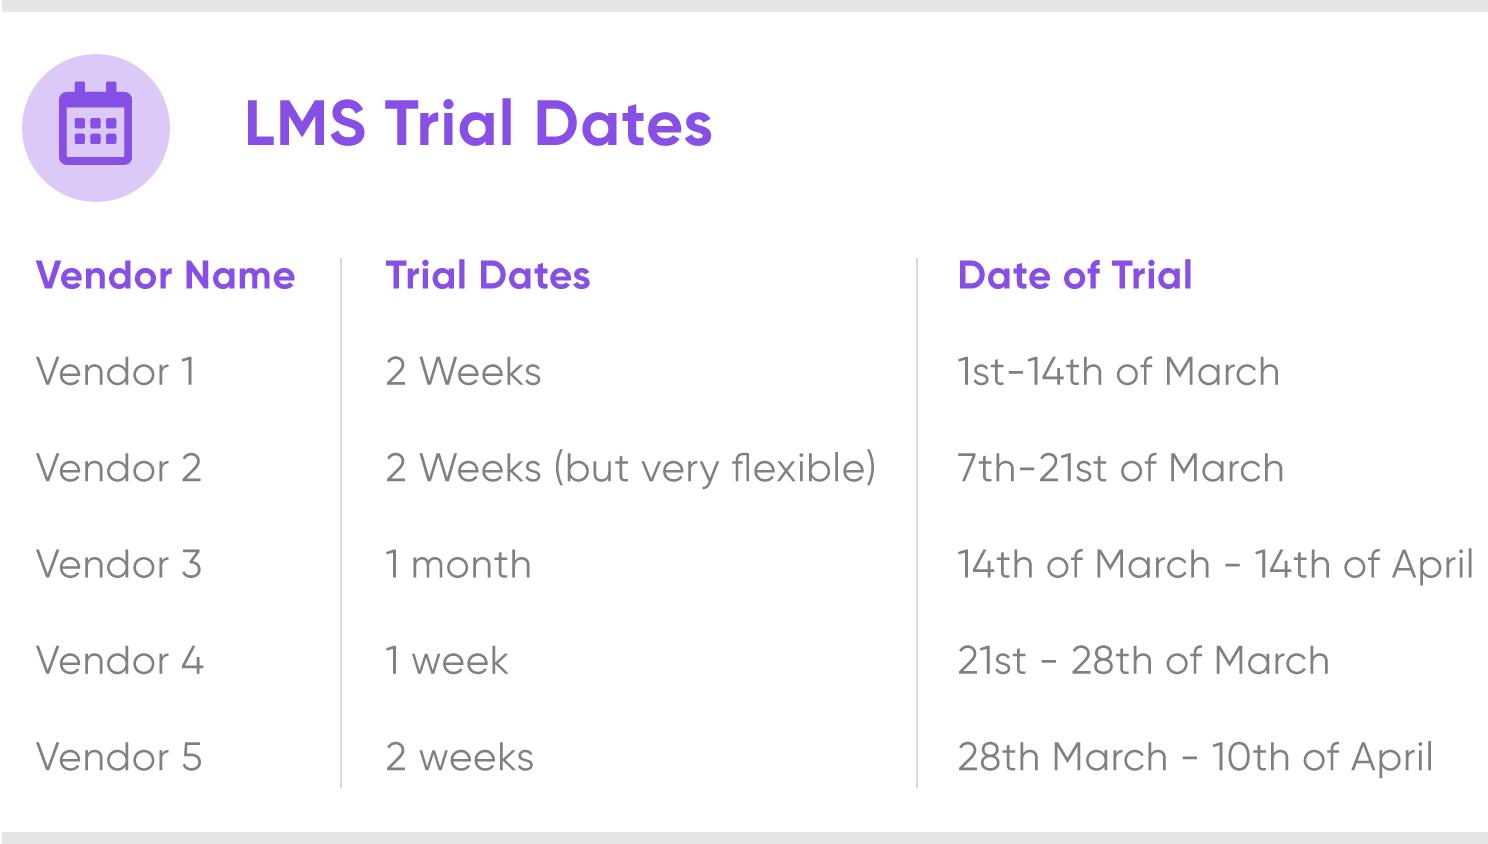 lms trial